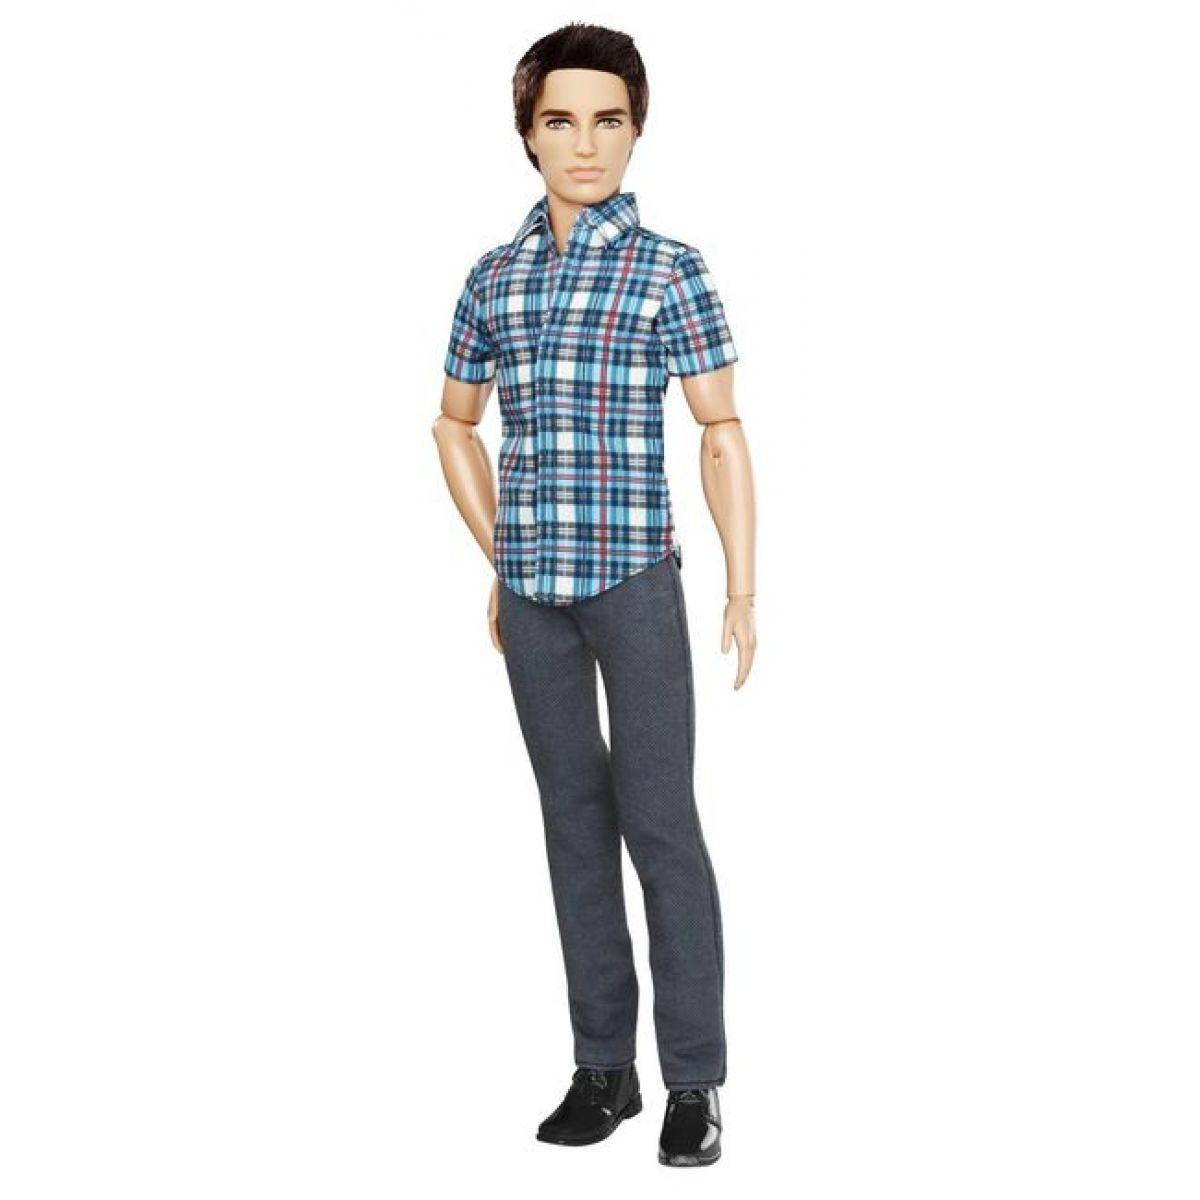 Barbie Fashionistas Ken - Ryan v kalhotech